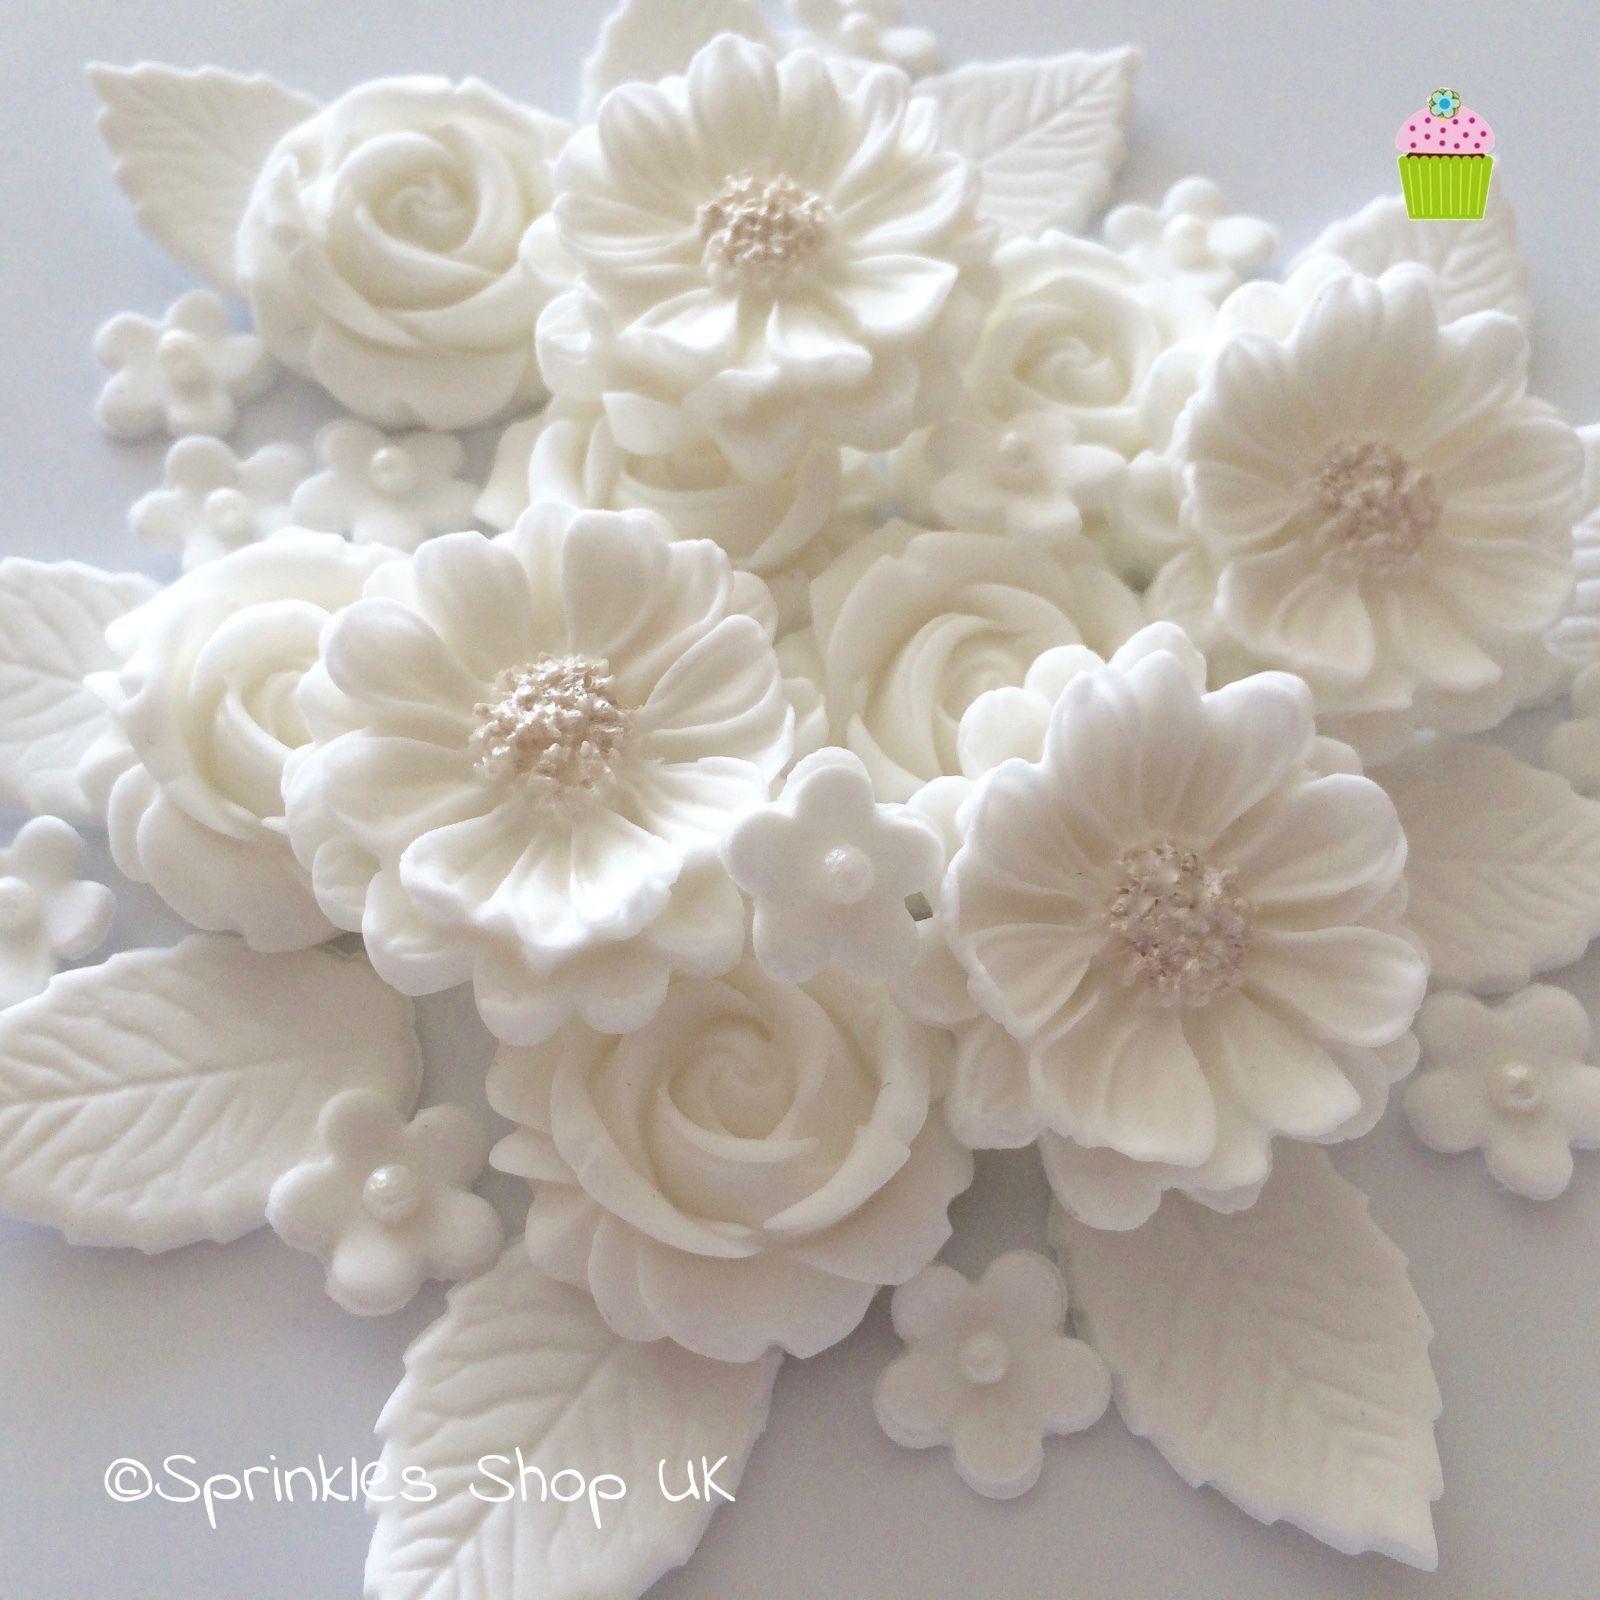 White Wedding Rose Bouquet Edible Sugar Paste Flowers Cake